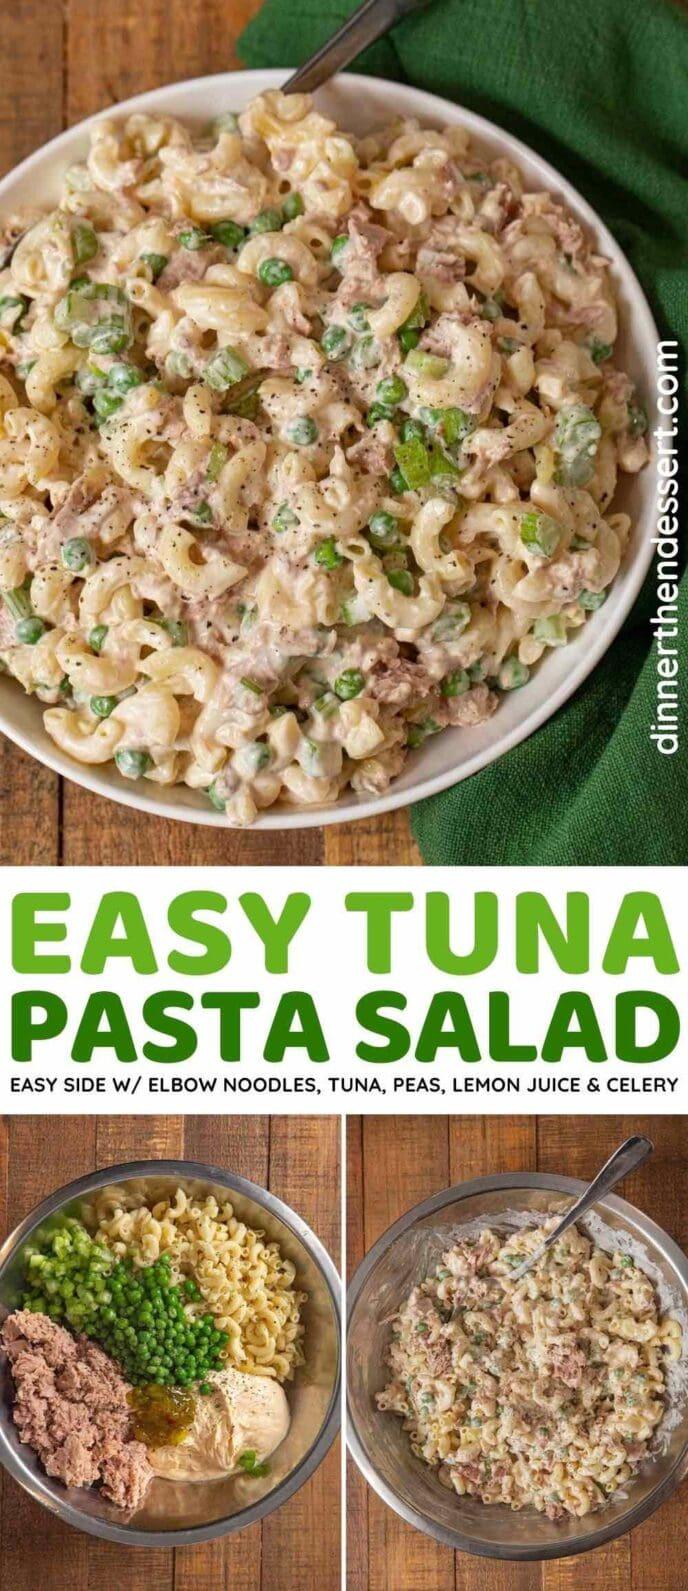 Tuna Pasta Salad collage